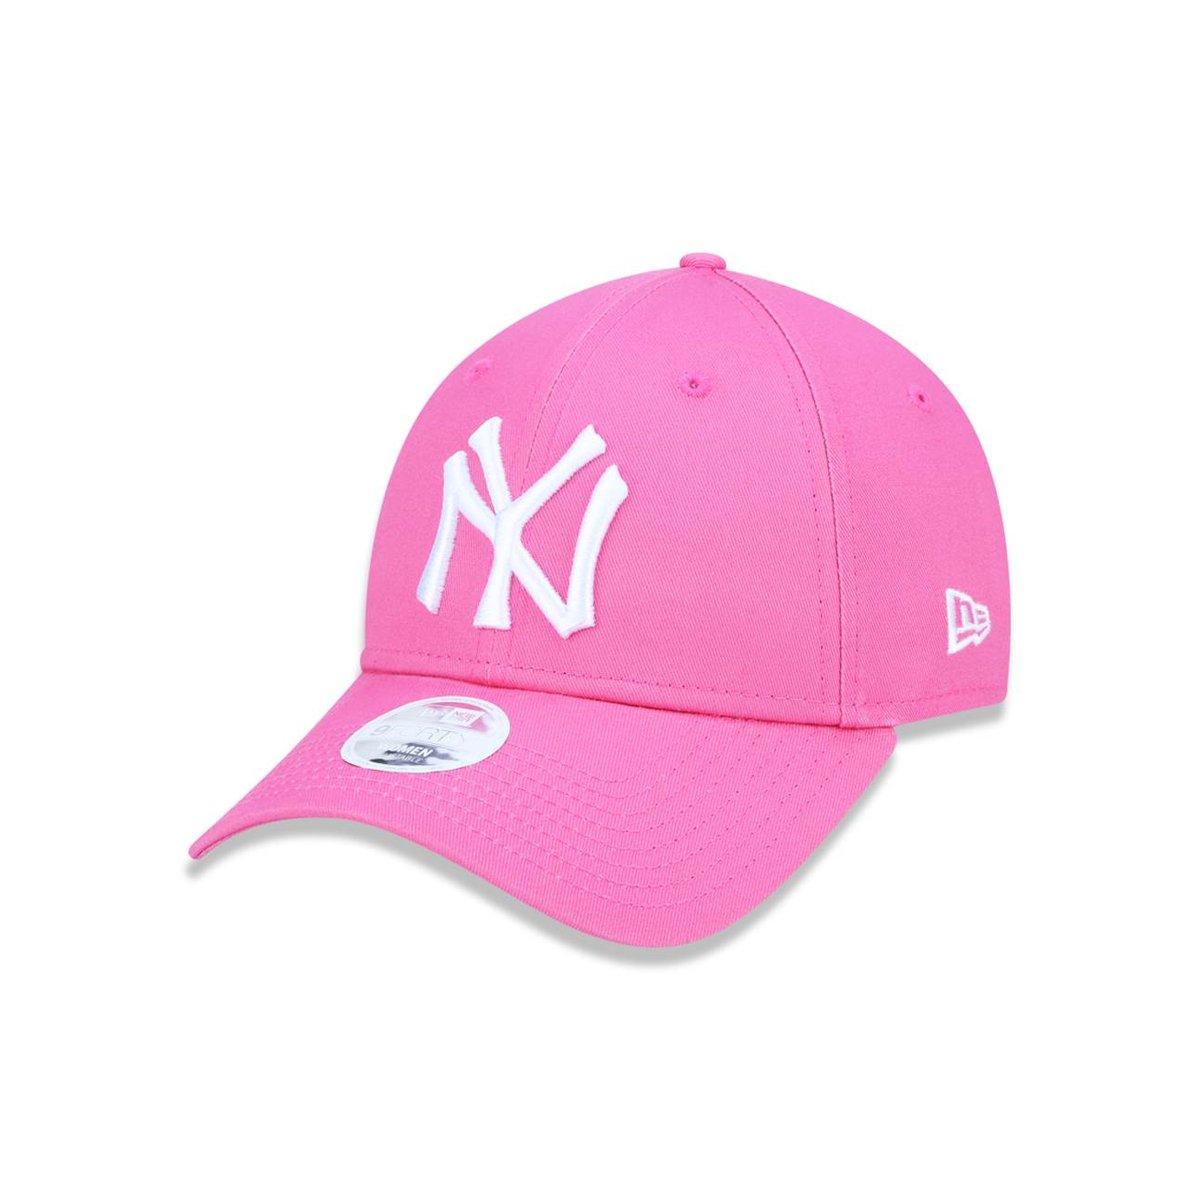 4080488a59289 Boné 940 New York Yankees MLB Aba Curva Snapback New Era - Compre Agora